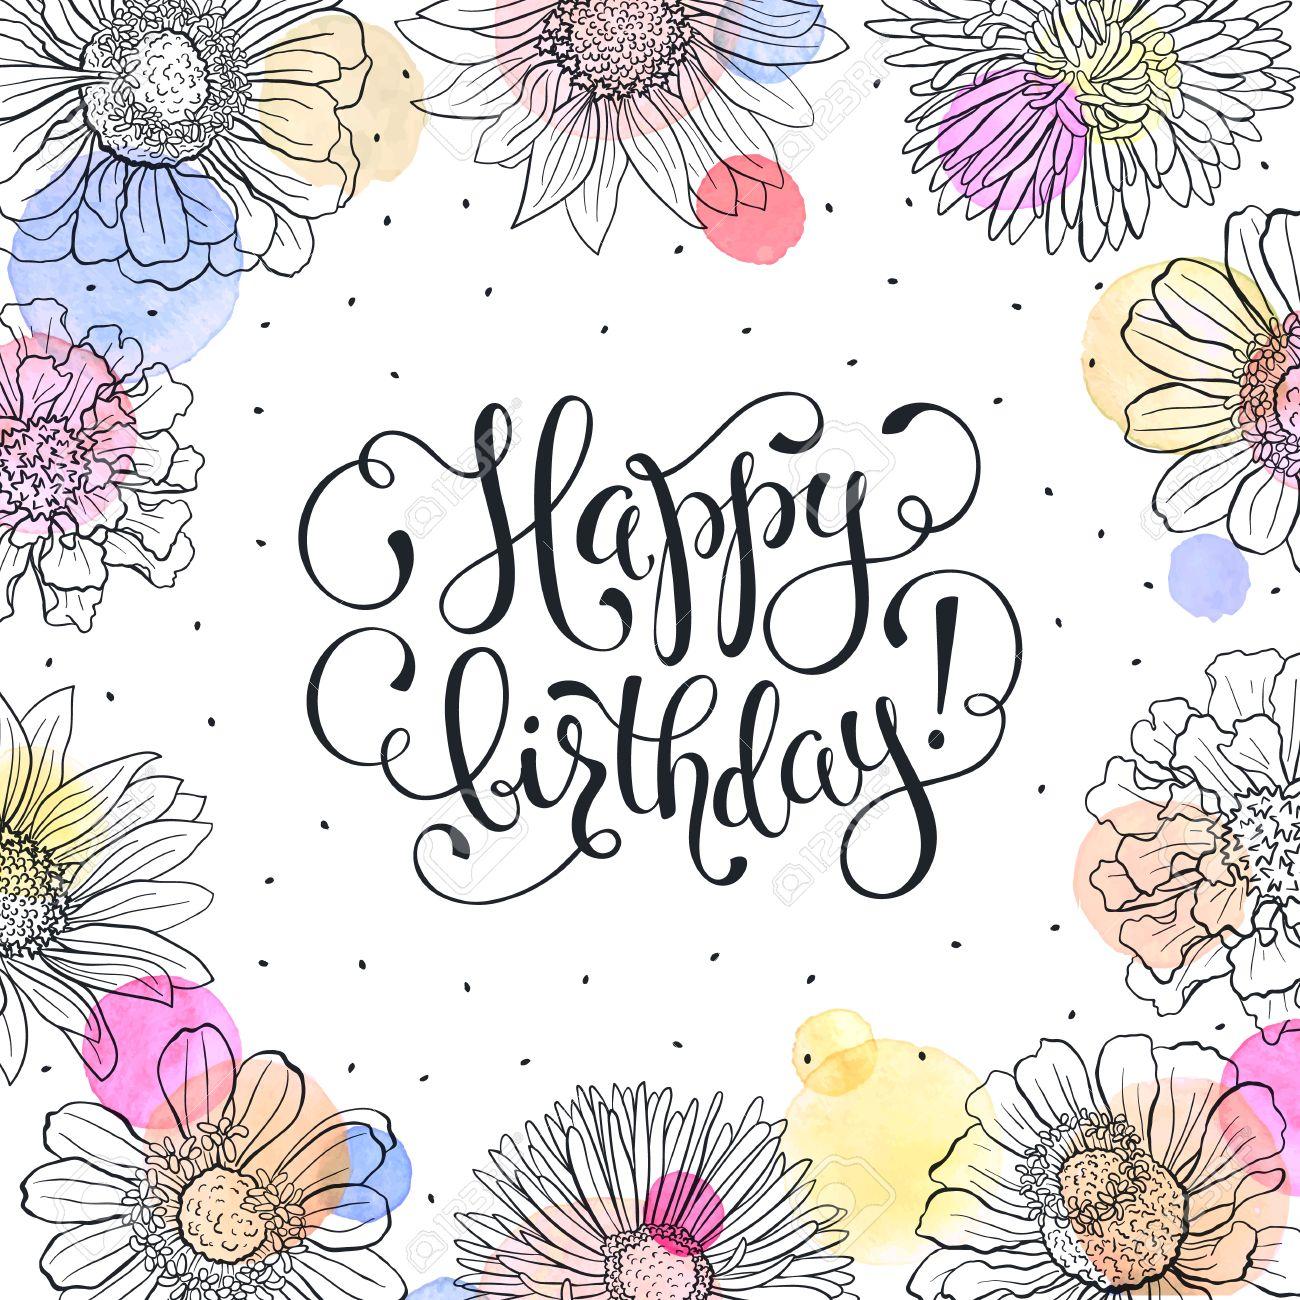 Happy birthday greeting card sketch flowers frame with watercolor happy birthday greeting card sketch flowers frame with watercolor spots on white background birthday kristyandbryce Gallery